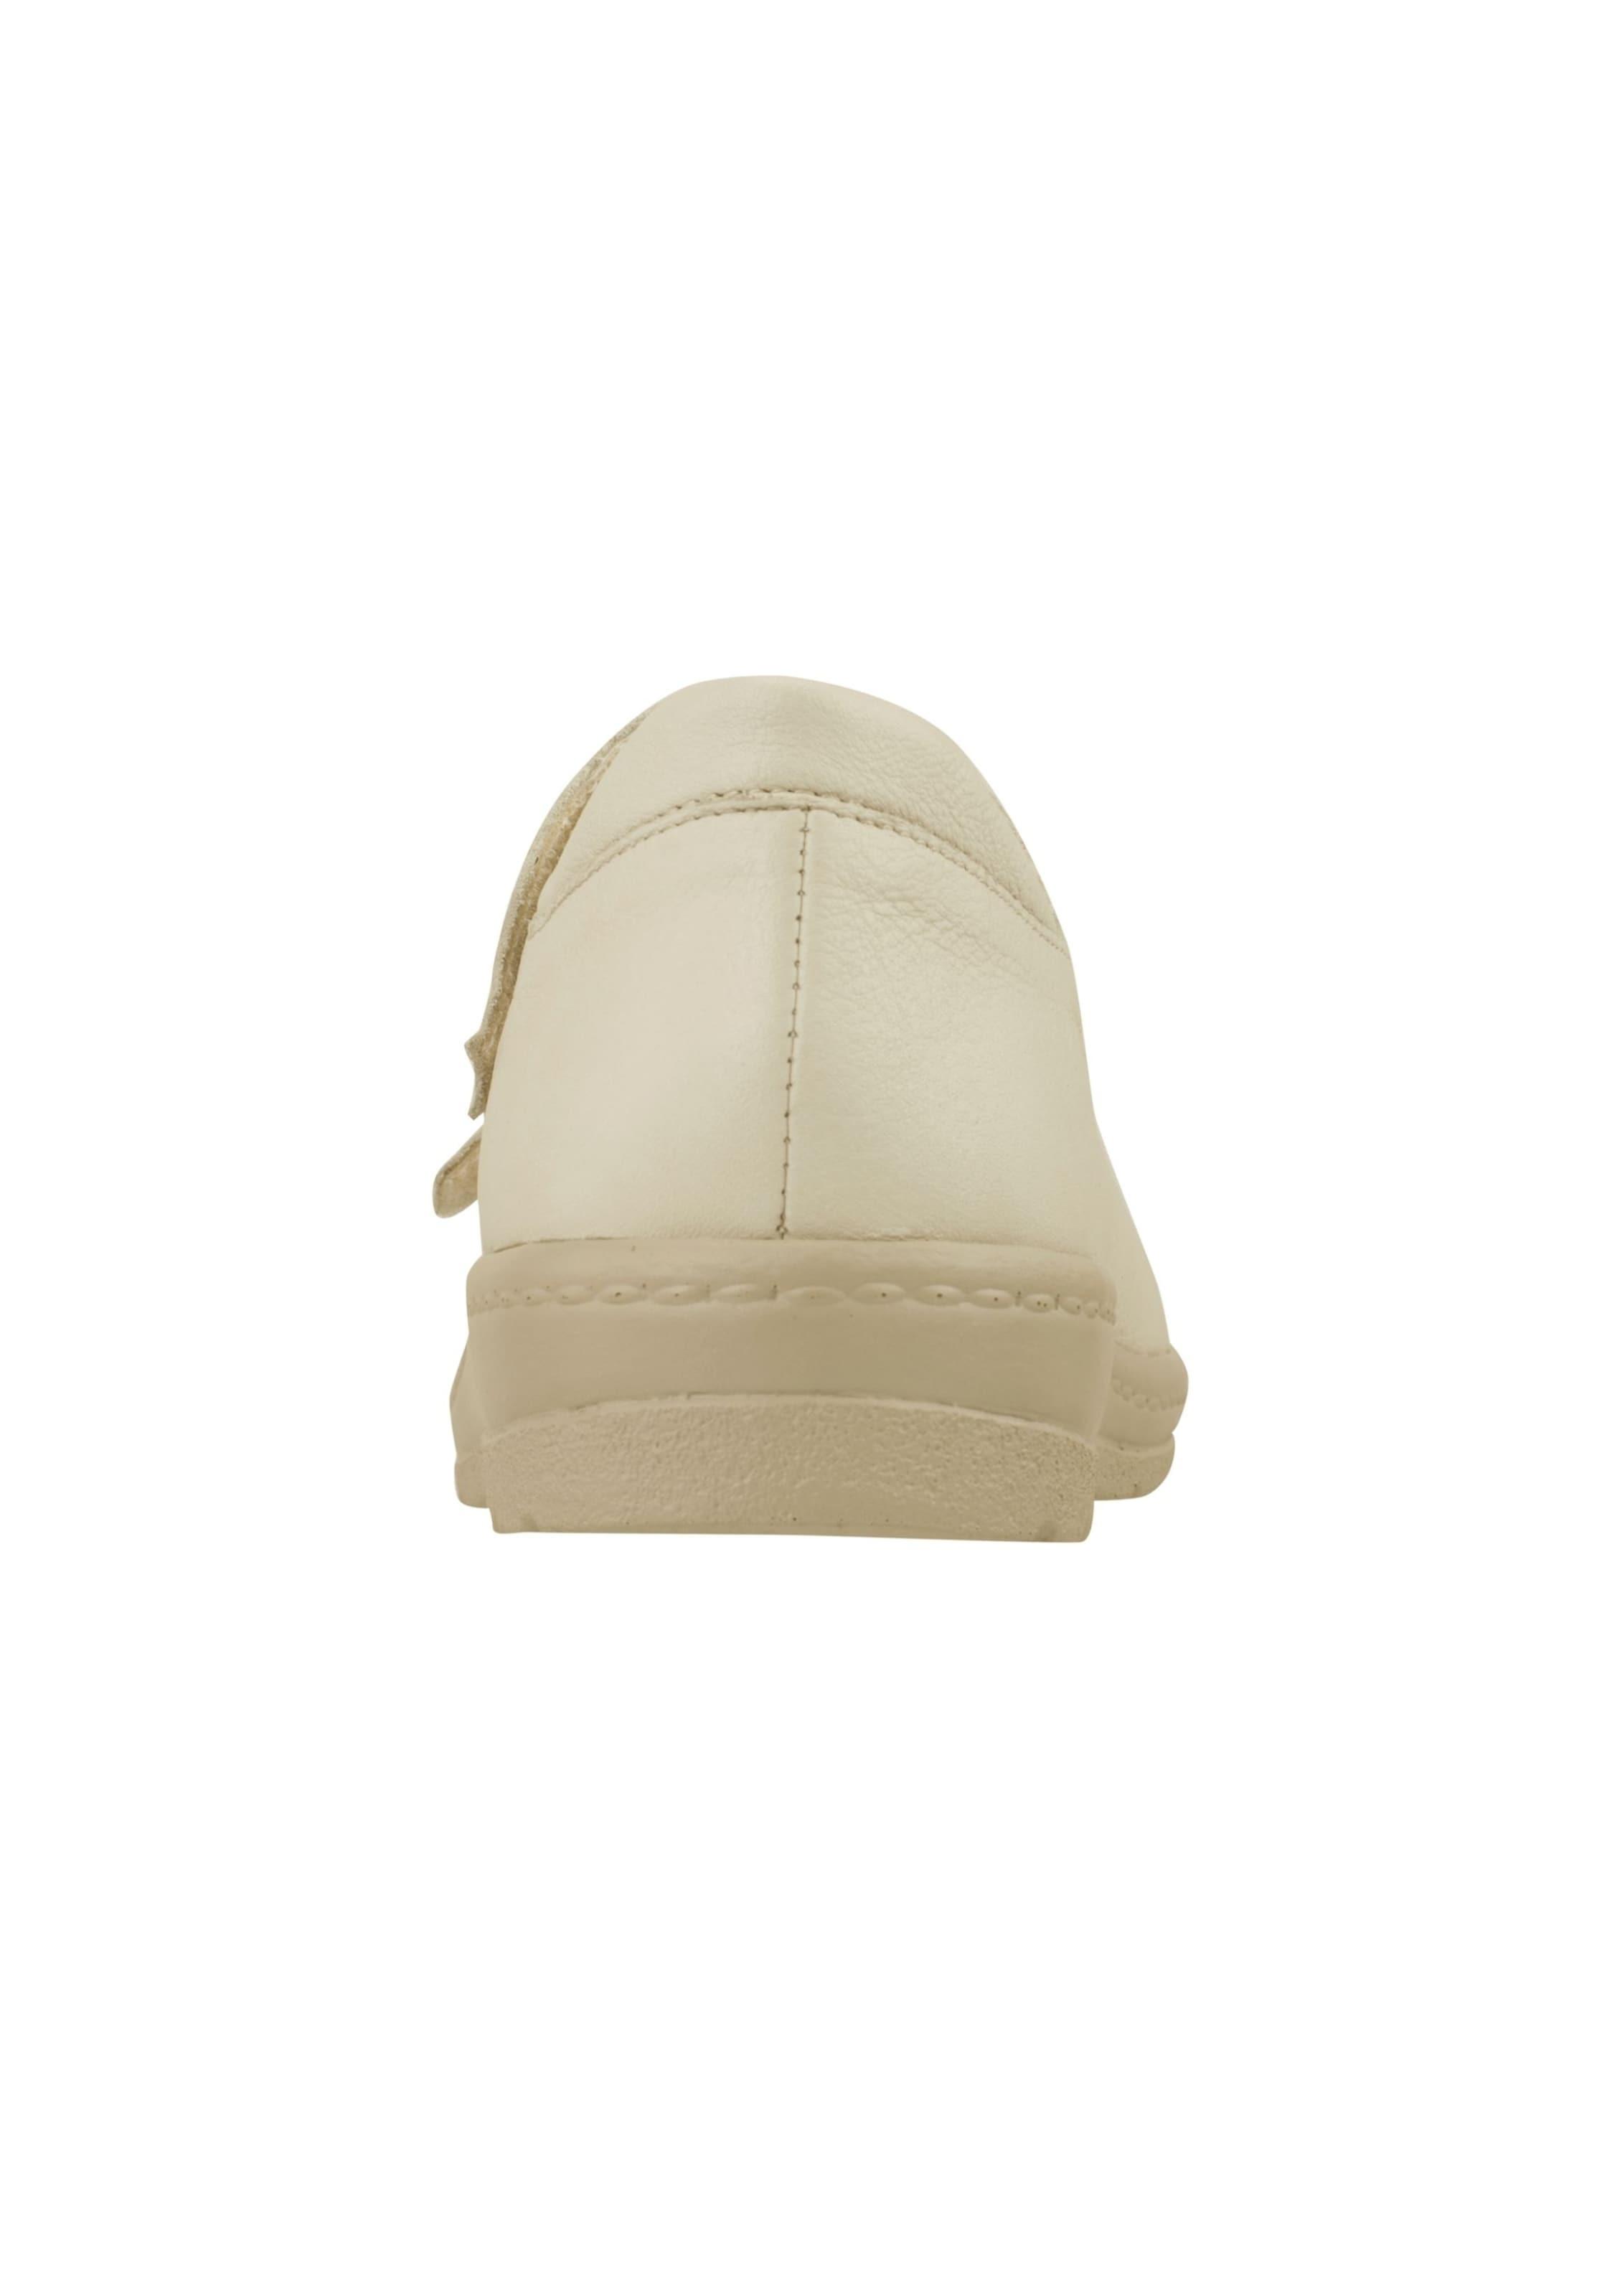 Sandale In Natural 'casablanca' Feet Beige kuZiPOTX